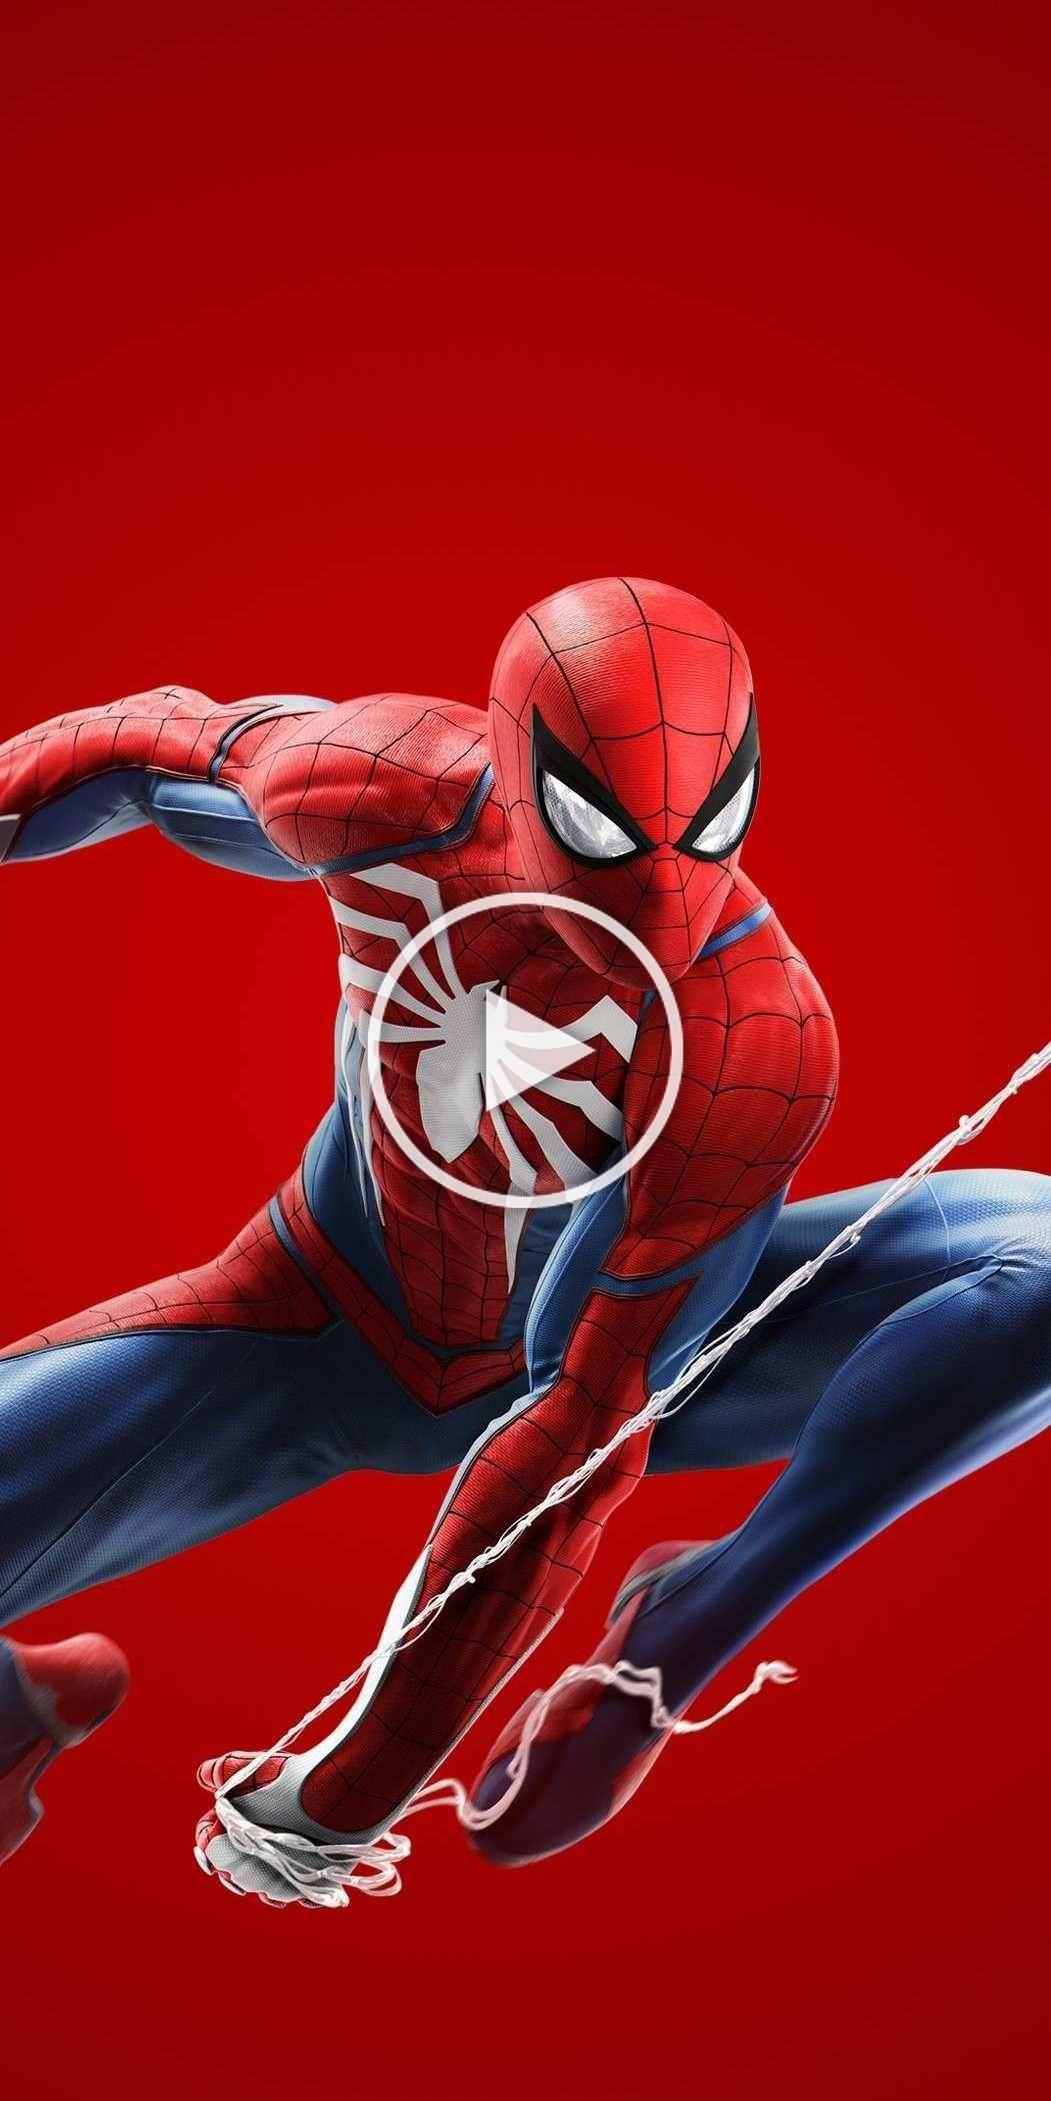 Spider Man Video Game Wallpaper